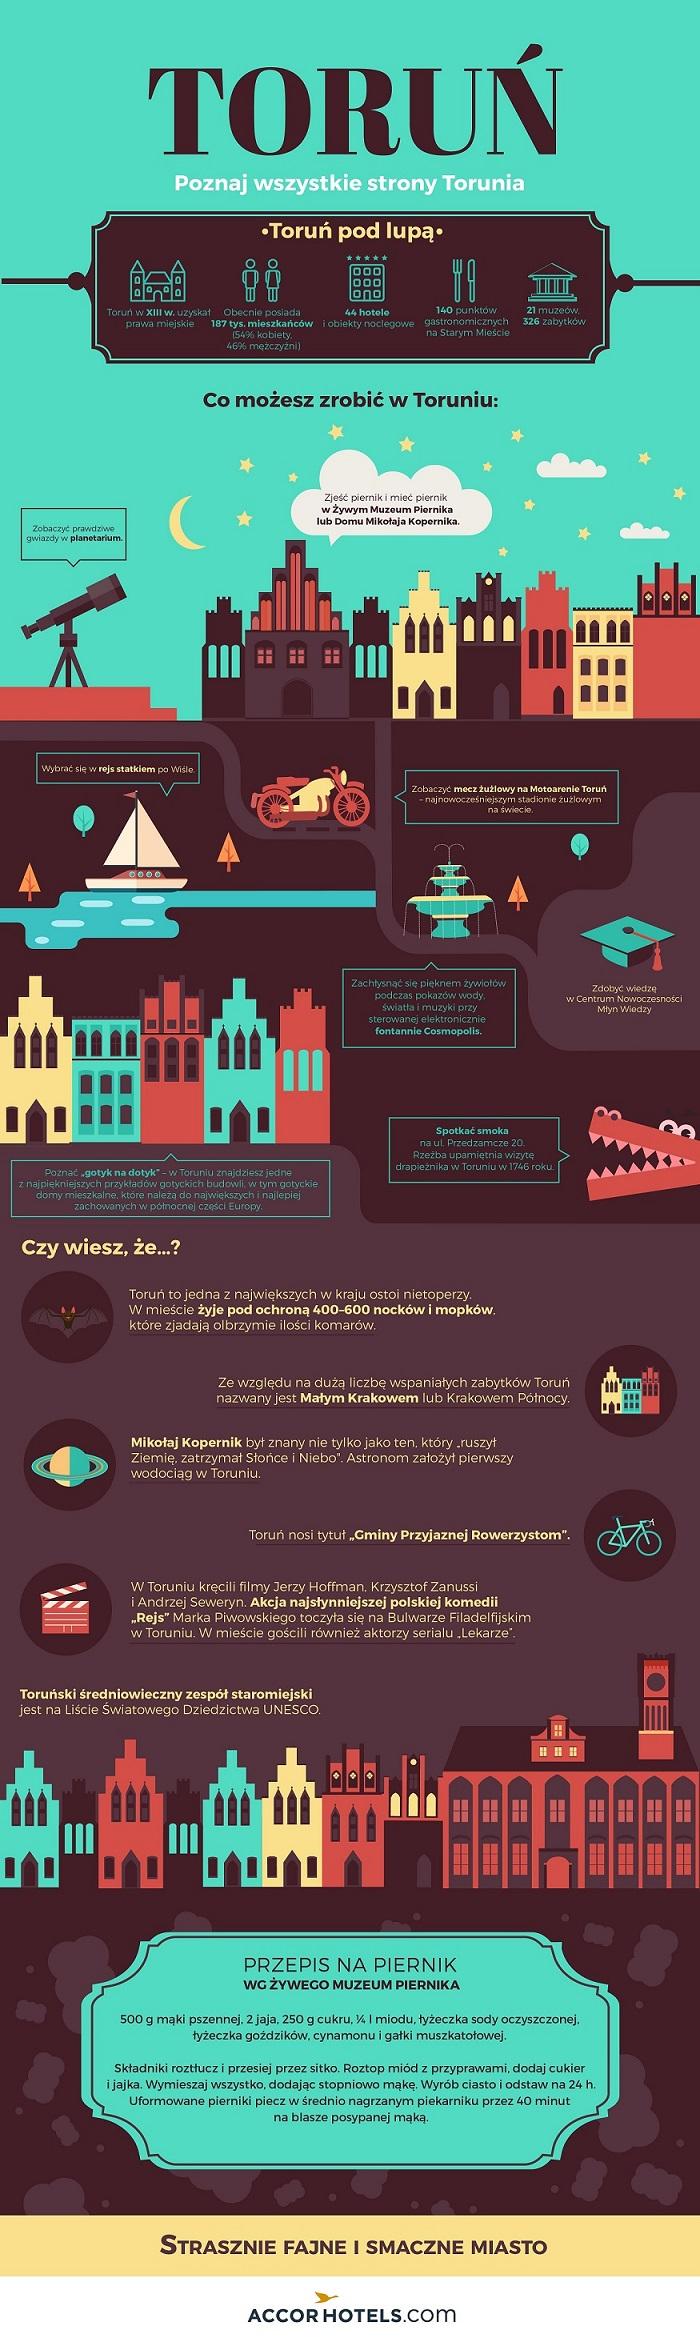 Infografika Torun - AccorHotels.com